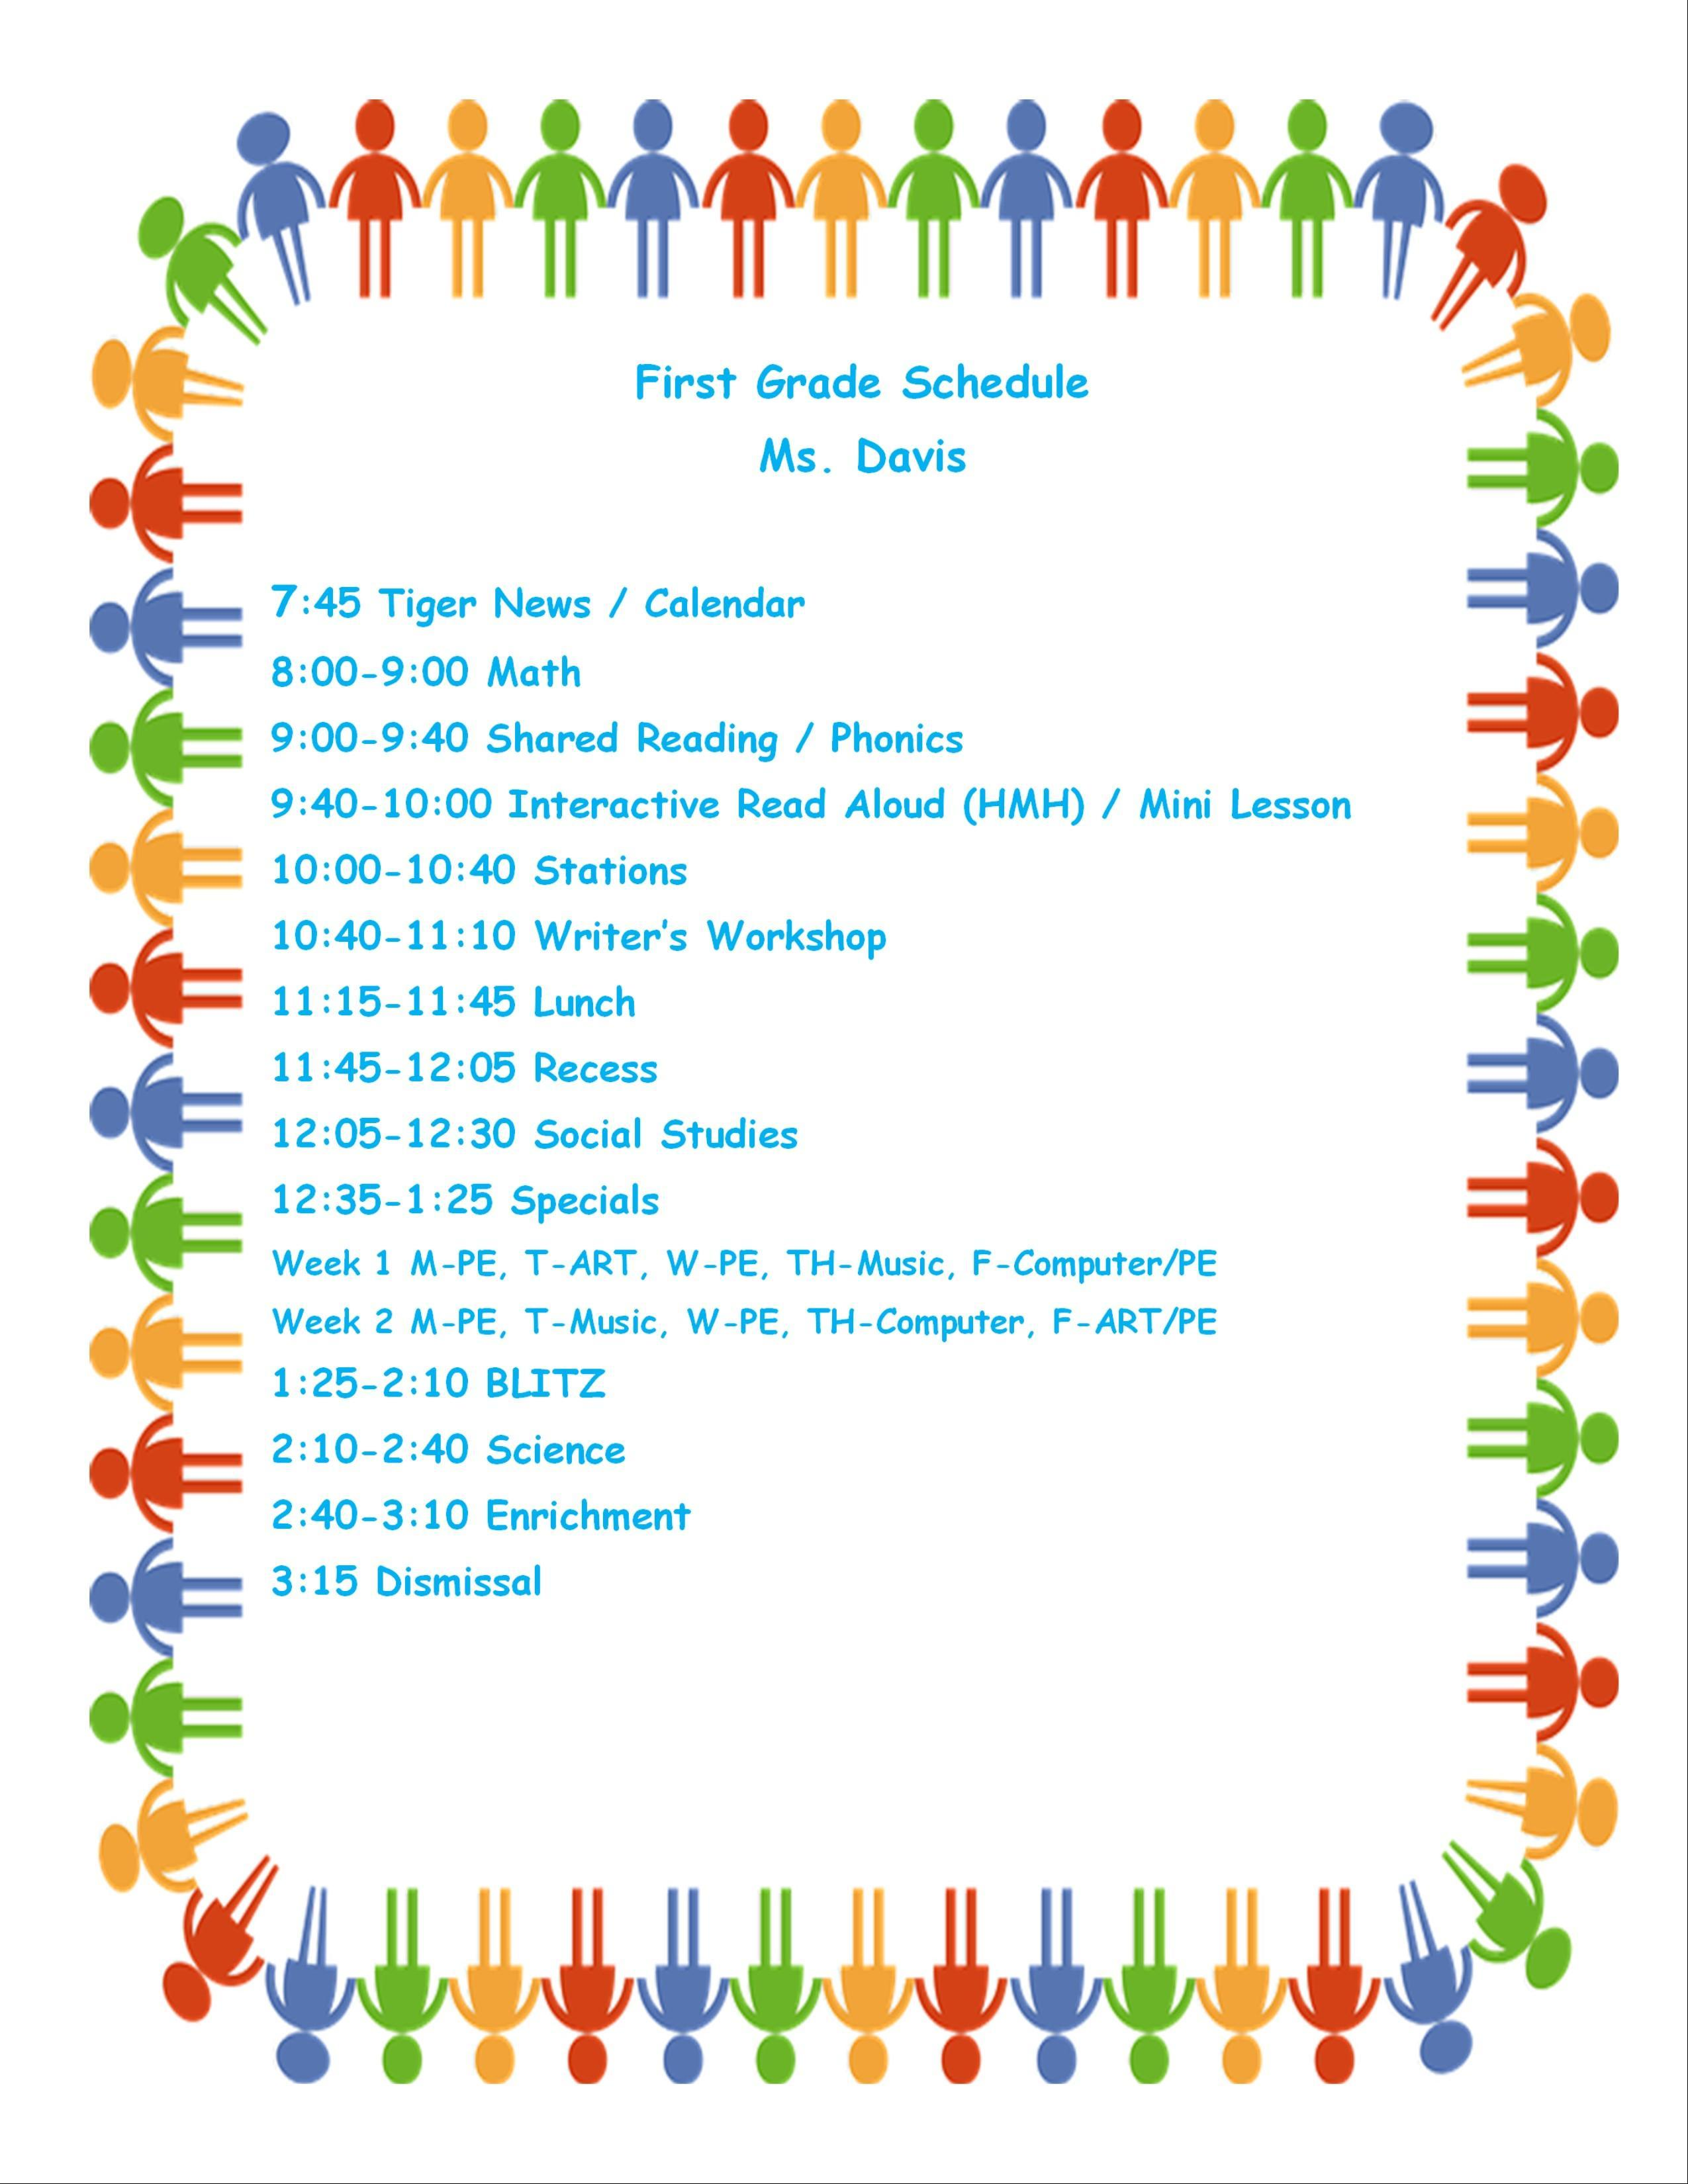 First Grade Schedule Ms. Davis  7:45 Tiger News / Calendar 8:00-9:00 Math 9:00-9:40 Shared Reading / Phonics 9:40-10:00 Interactive Read Aloud (HMH) / Mini Lesson 10:00-10:40 Stations 10:40-11:10 Writer's Workshop 11:15-11:45 Lunch 11:45-12:05 Recess 12:05-12:30 Social Studies 12:35-1:25 Specials Week 1 M-PE, T-ART, W-PE, TH-Music, F-Computer/PE Week 2 M-PE, T-Music, W-PE, TH-Computer, F-ART/PE 1:25-2:10 BLITZ 2:10-2:40 Science 2:40-3:10 Enrichment 3:15 Dismissal